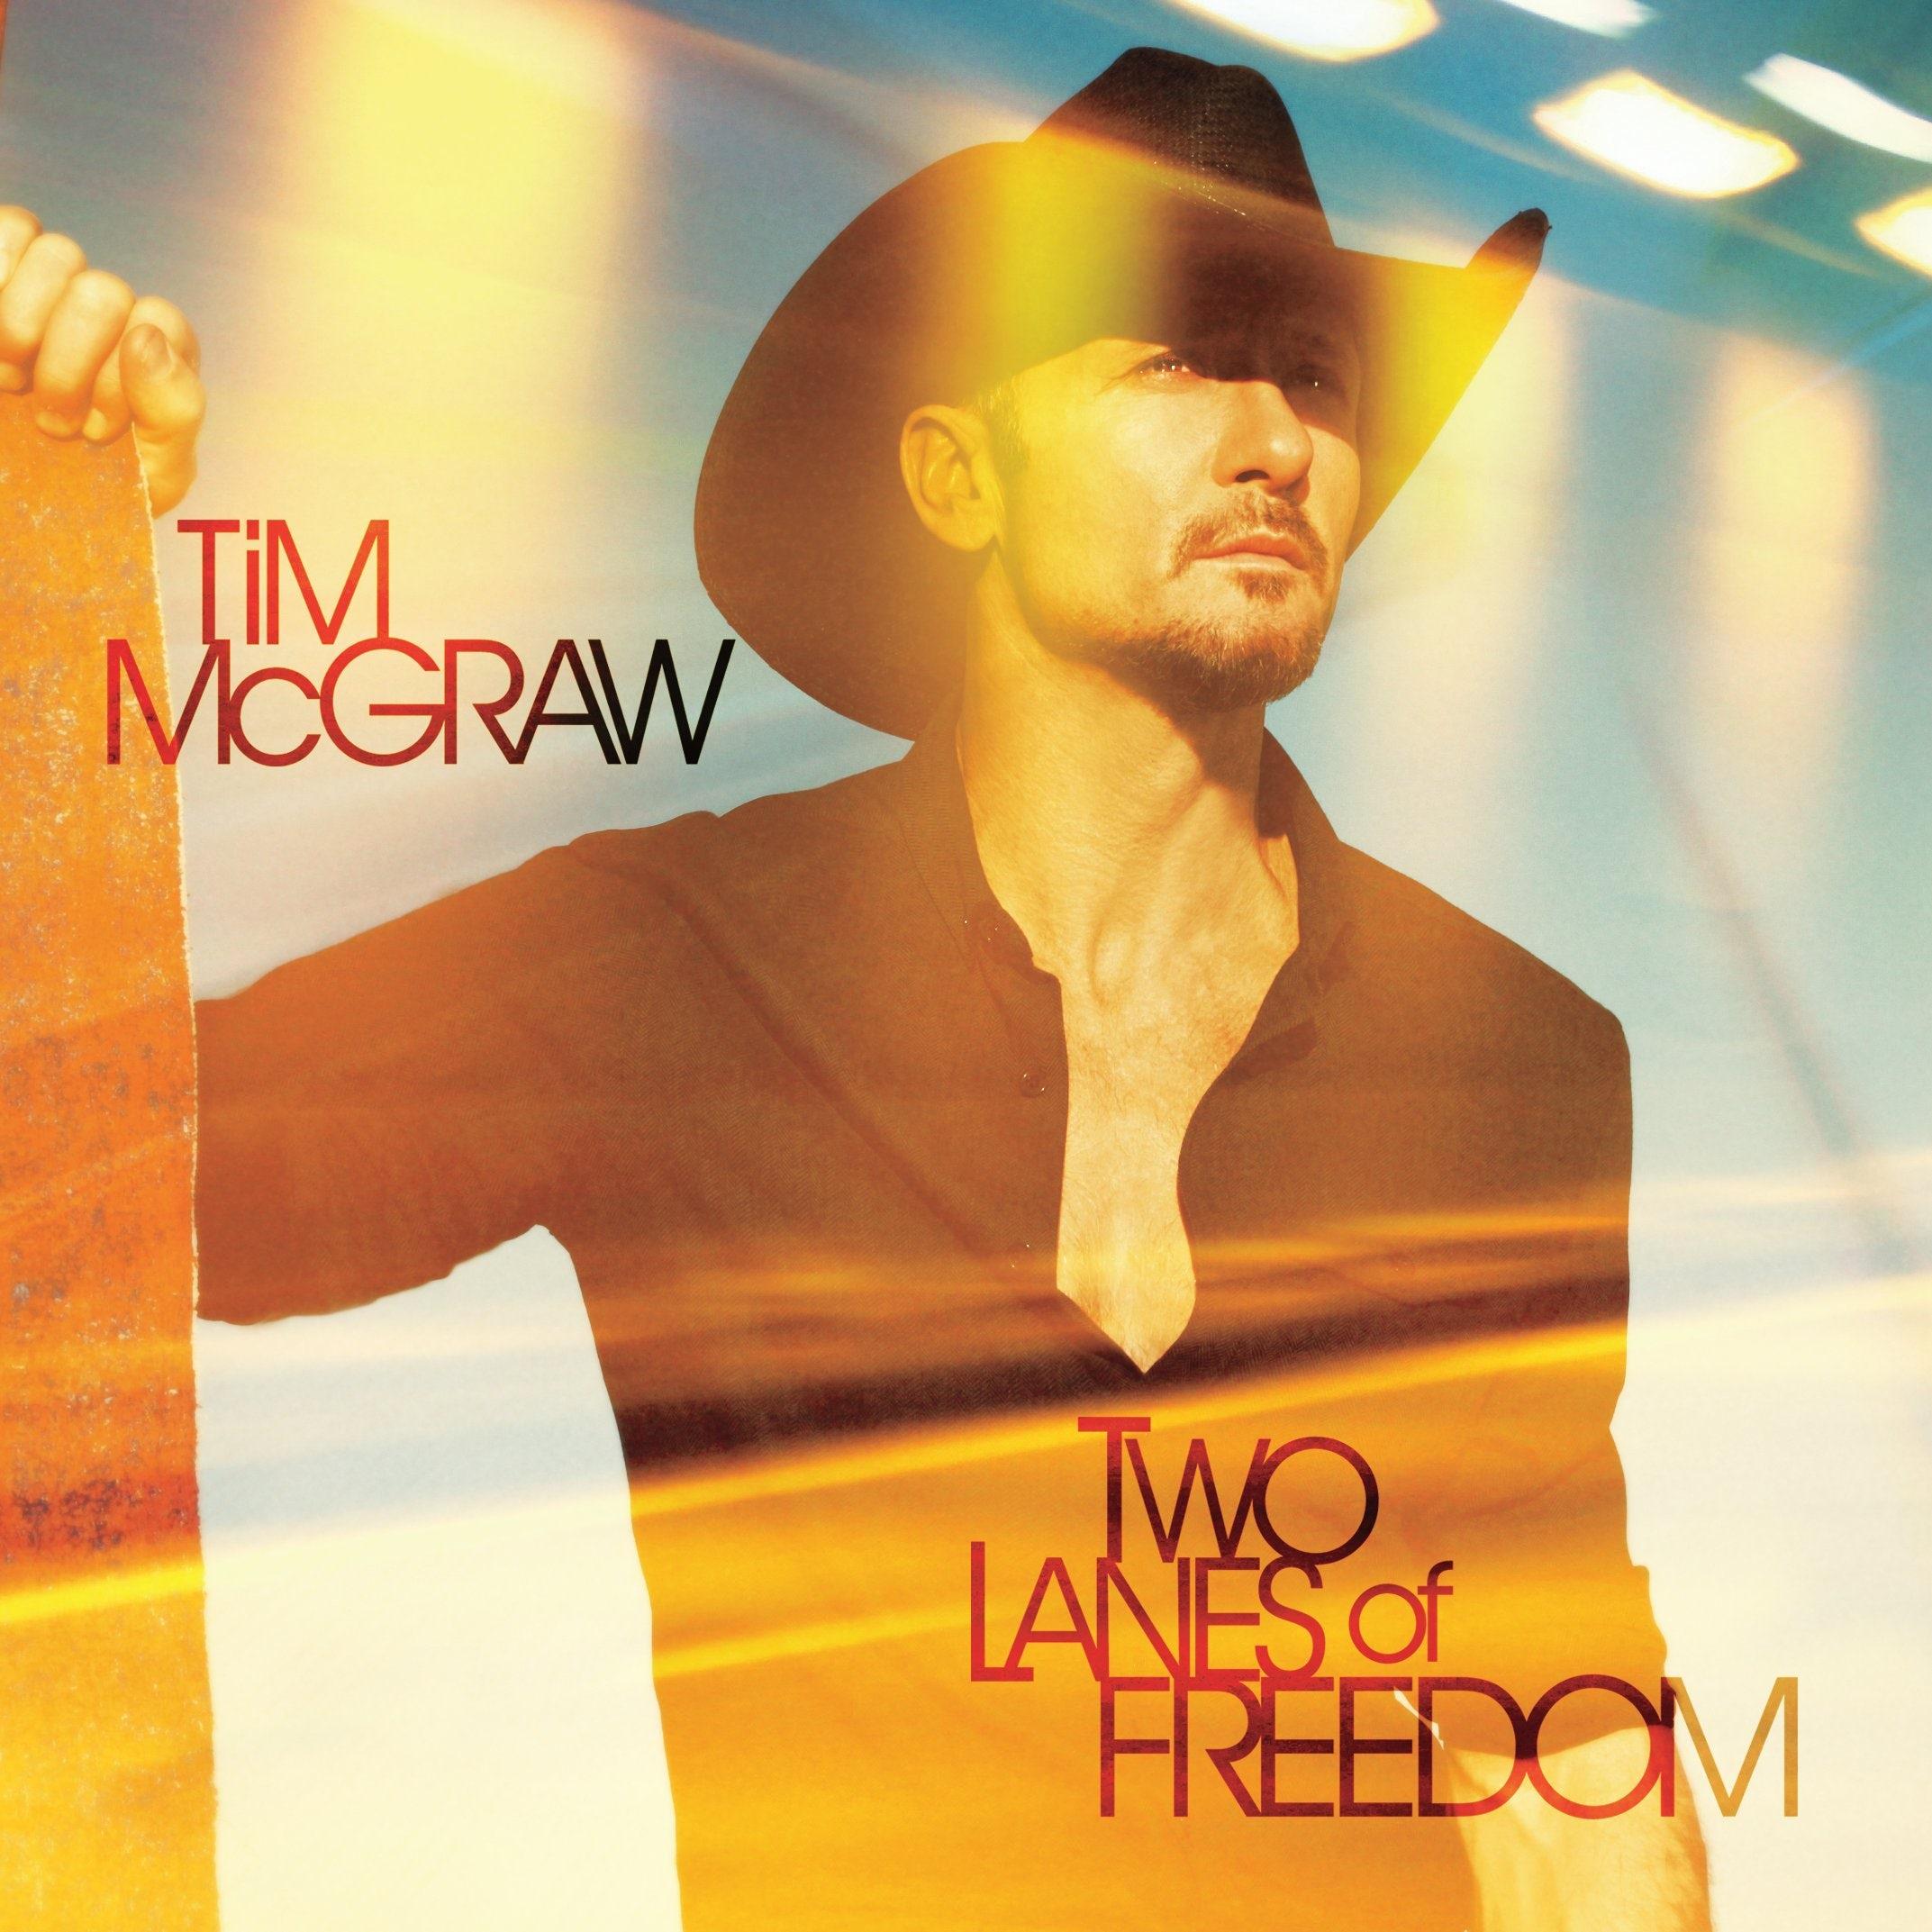 TIM MCGRAW TWO LANES OF FREEDOM MEN LONG SLEEVES T SHIRT